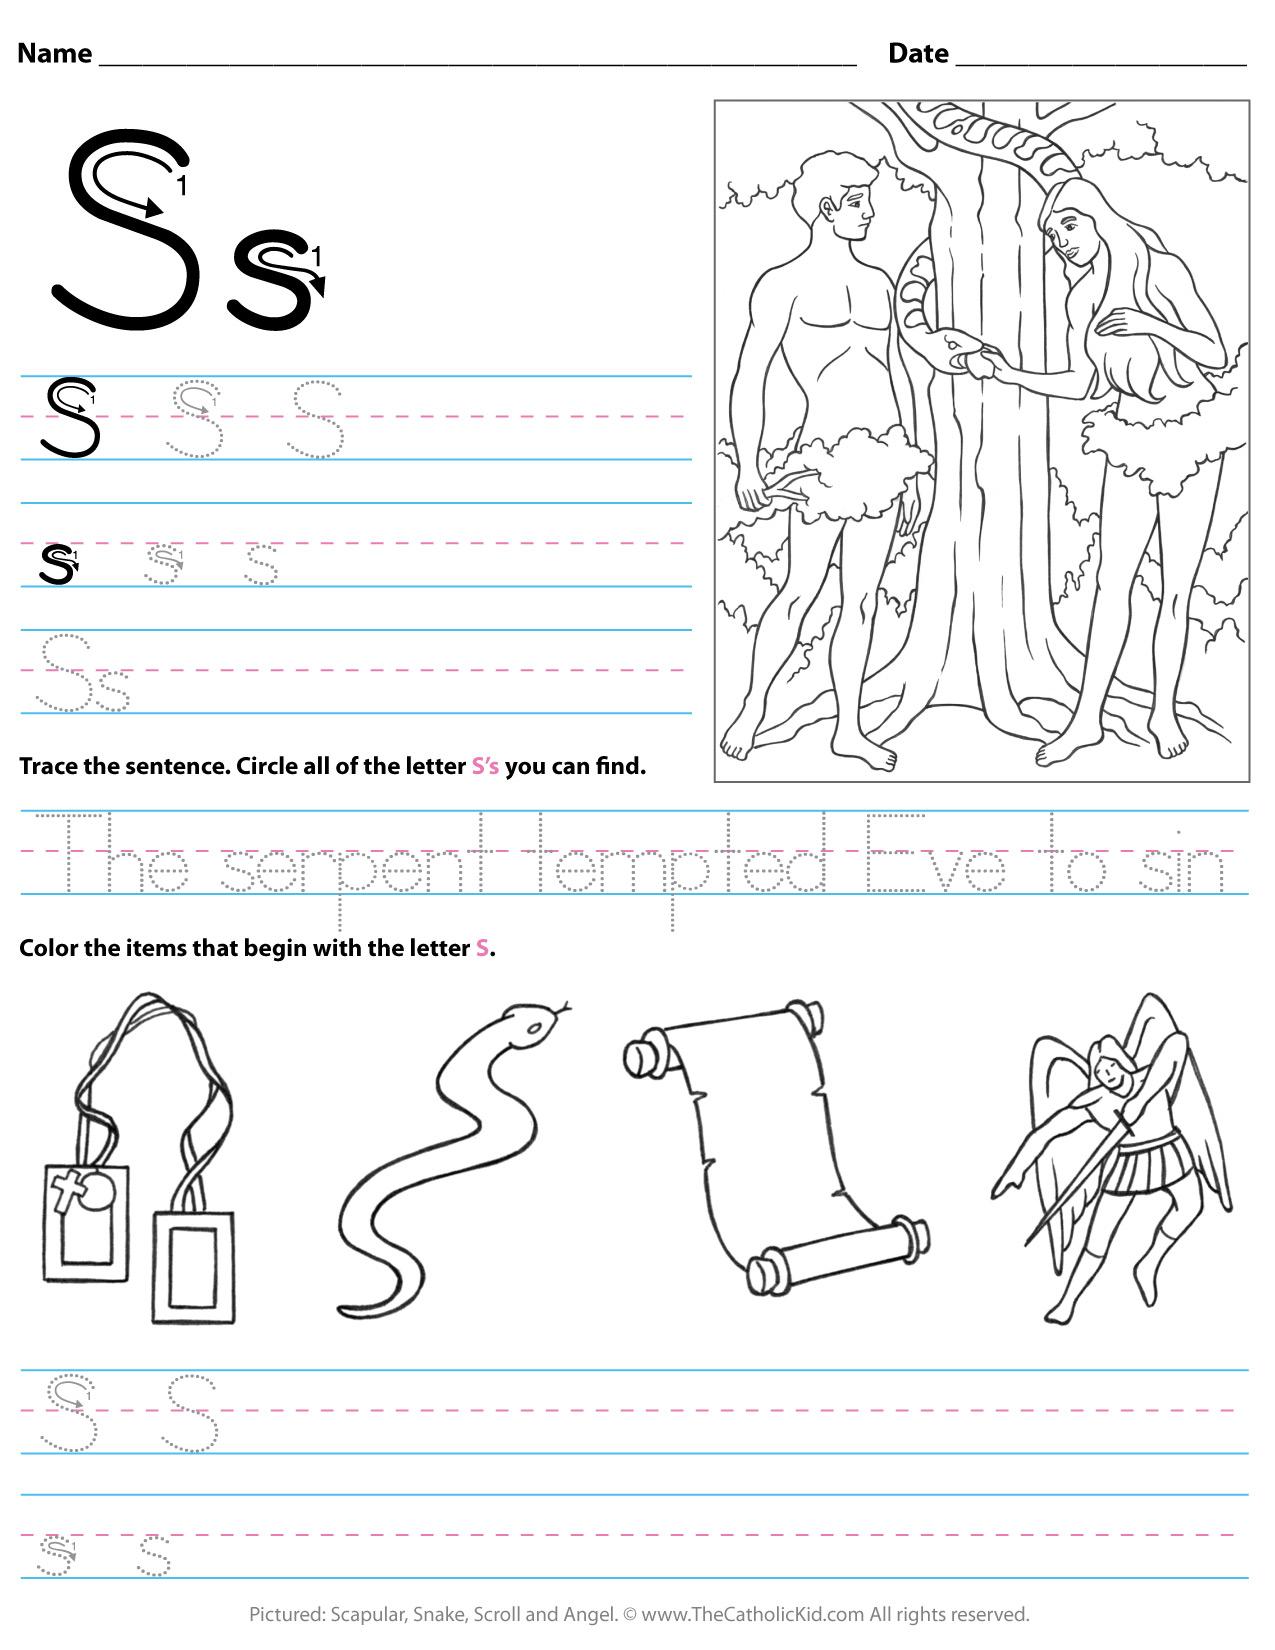 Catholic Alphabet Letter S Worksheet Preschool Kindergarten intended for A Letter Worksheets Kindergarten